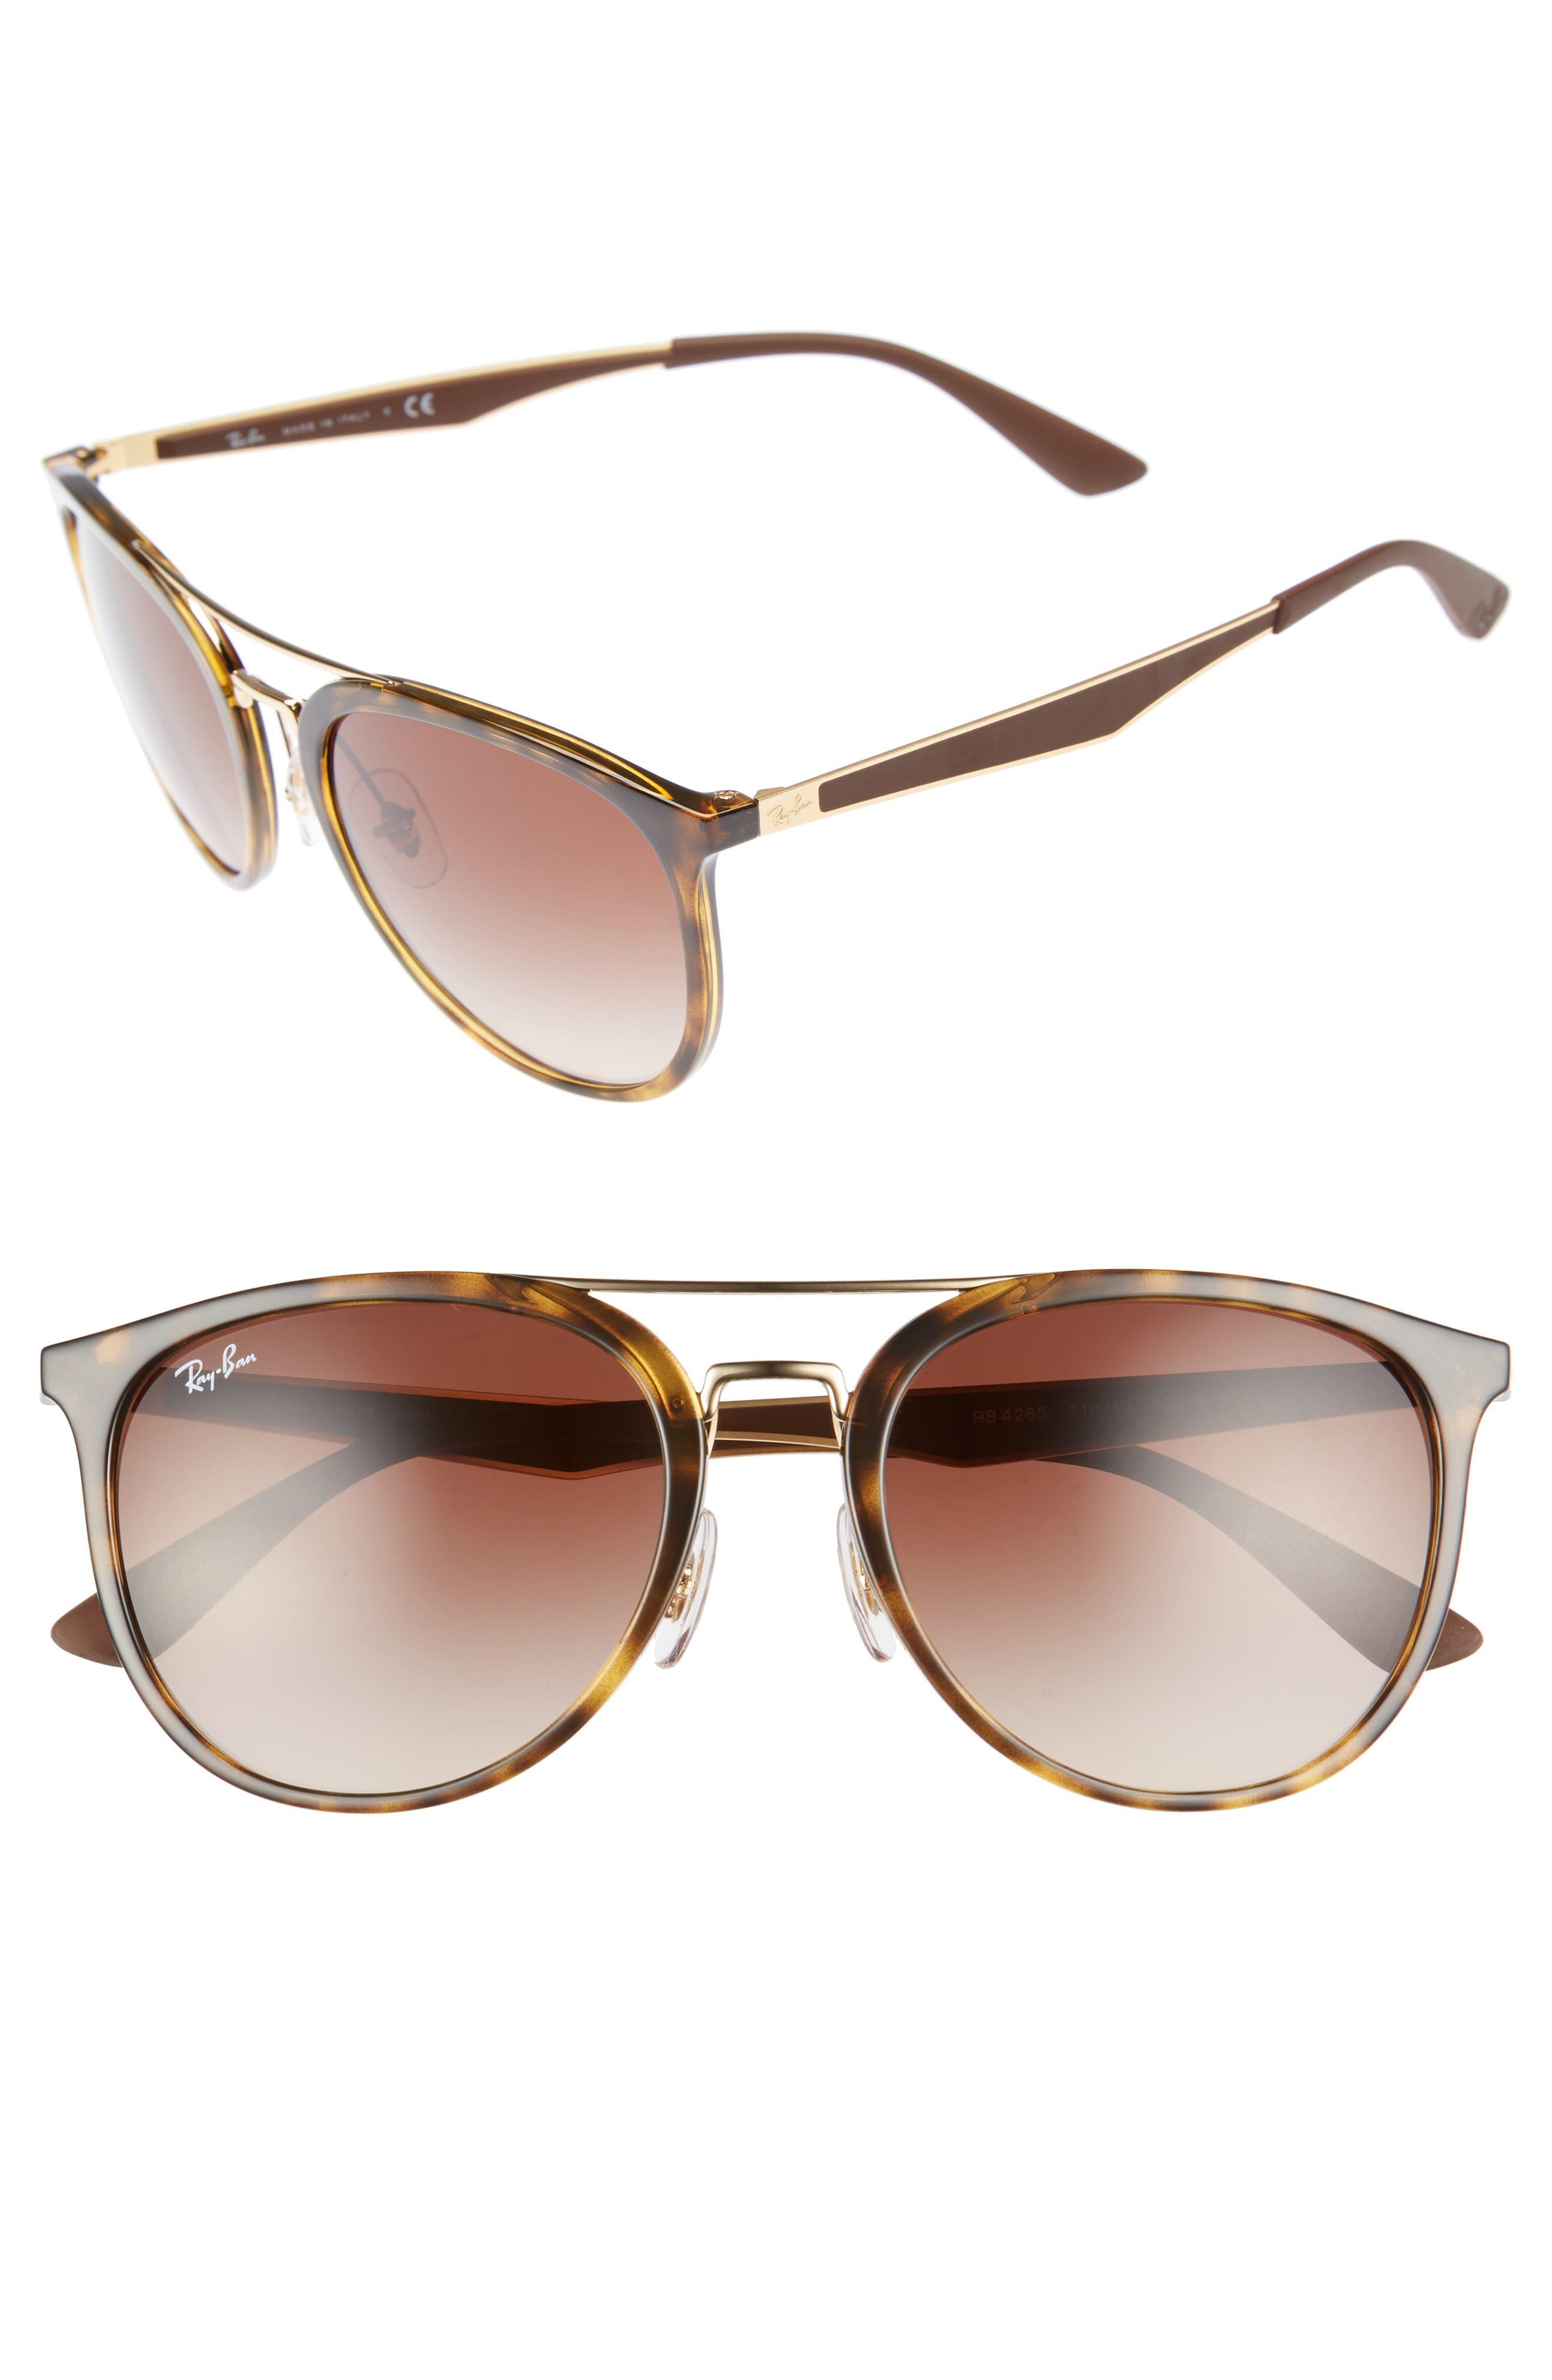 Ray-Ban 55mm Retro Sunglasses